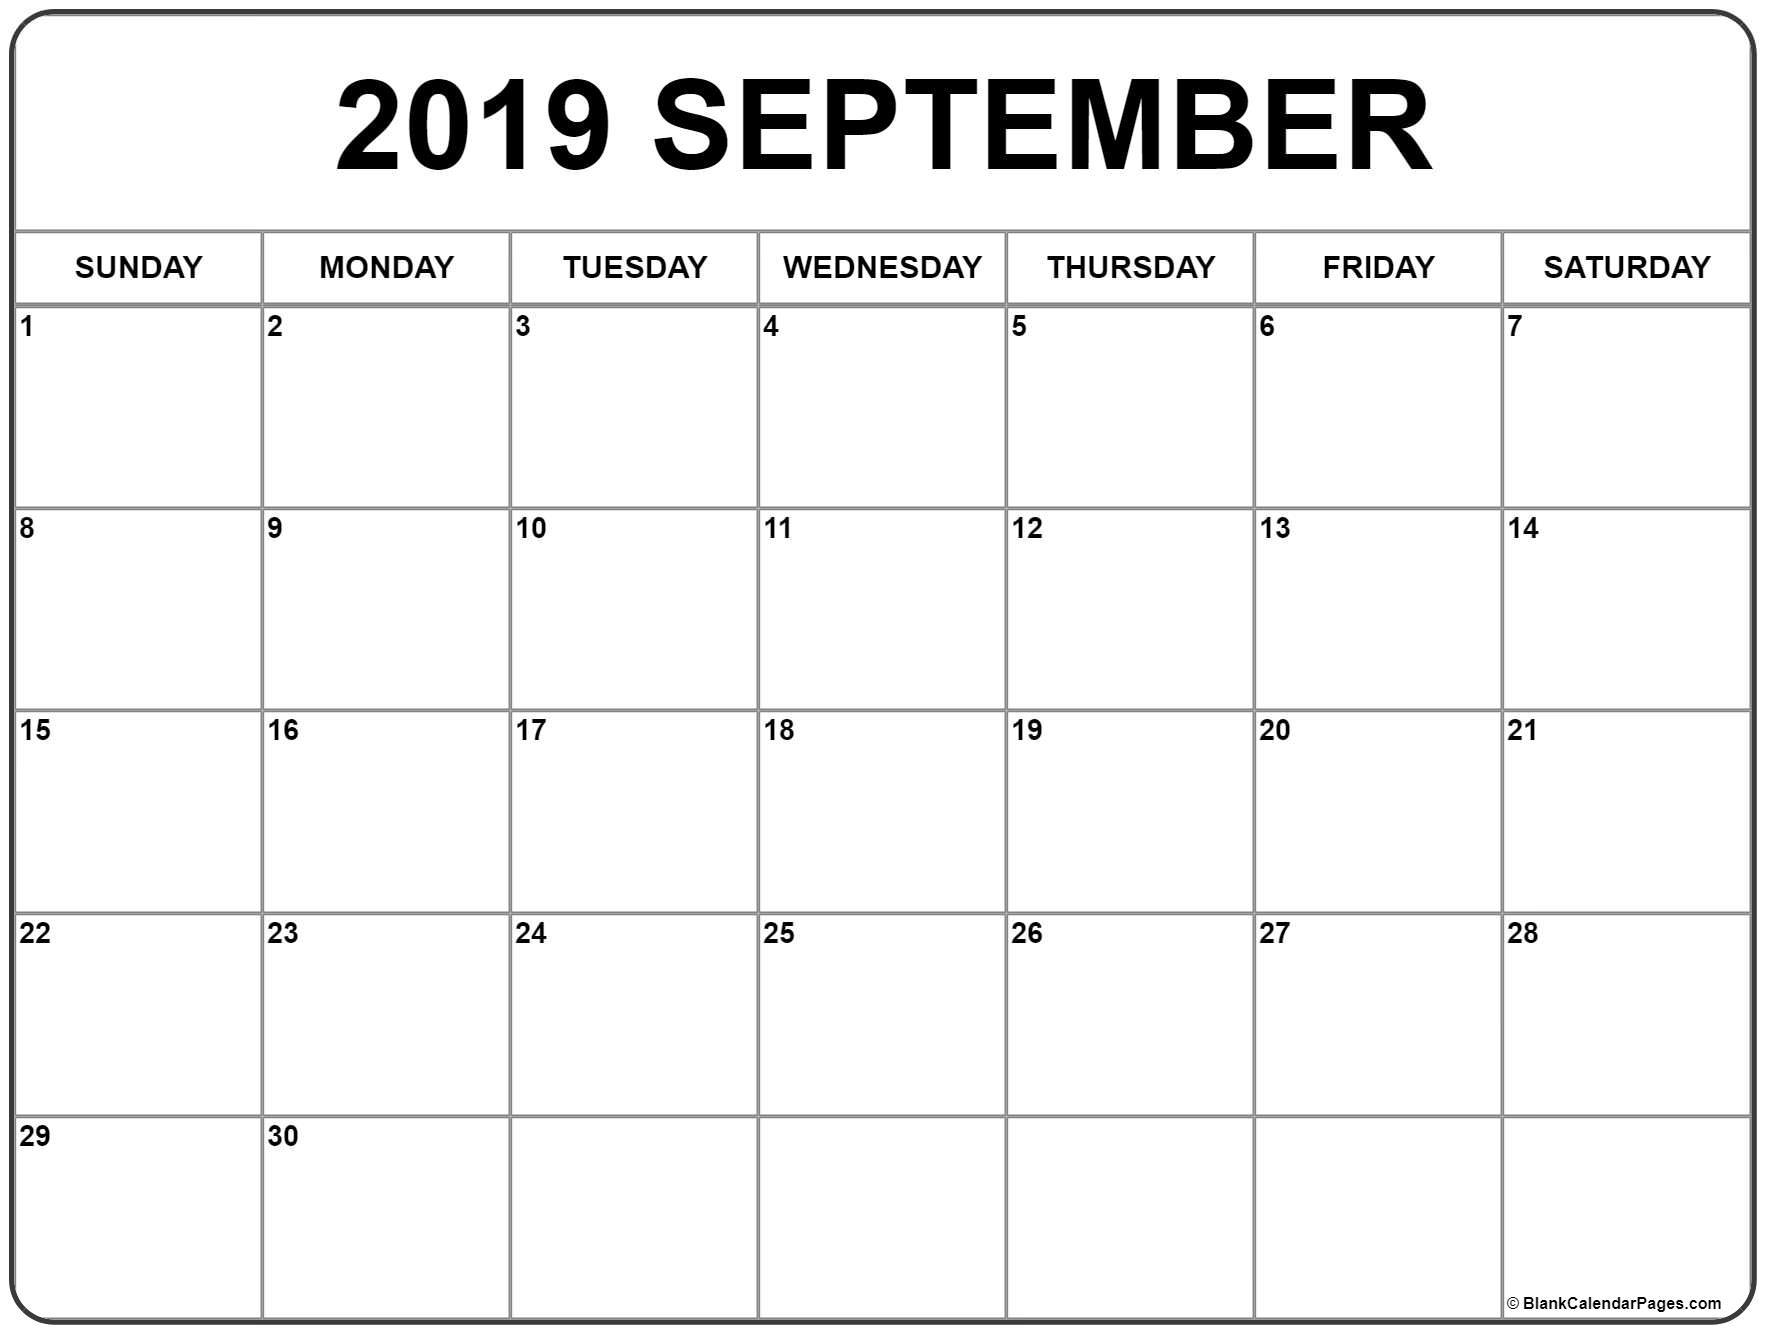 September 2019 Calendar | Free Printable Monthly Calendars for September Calendar Printable Template Blank